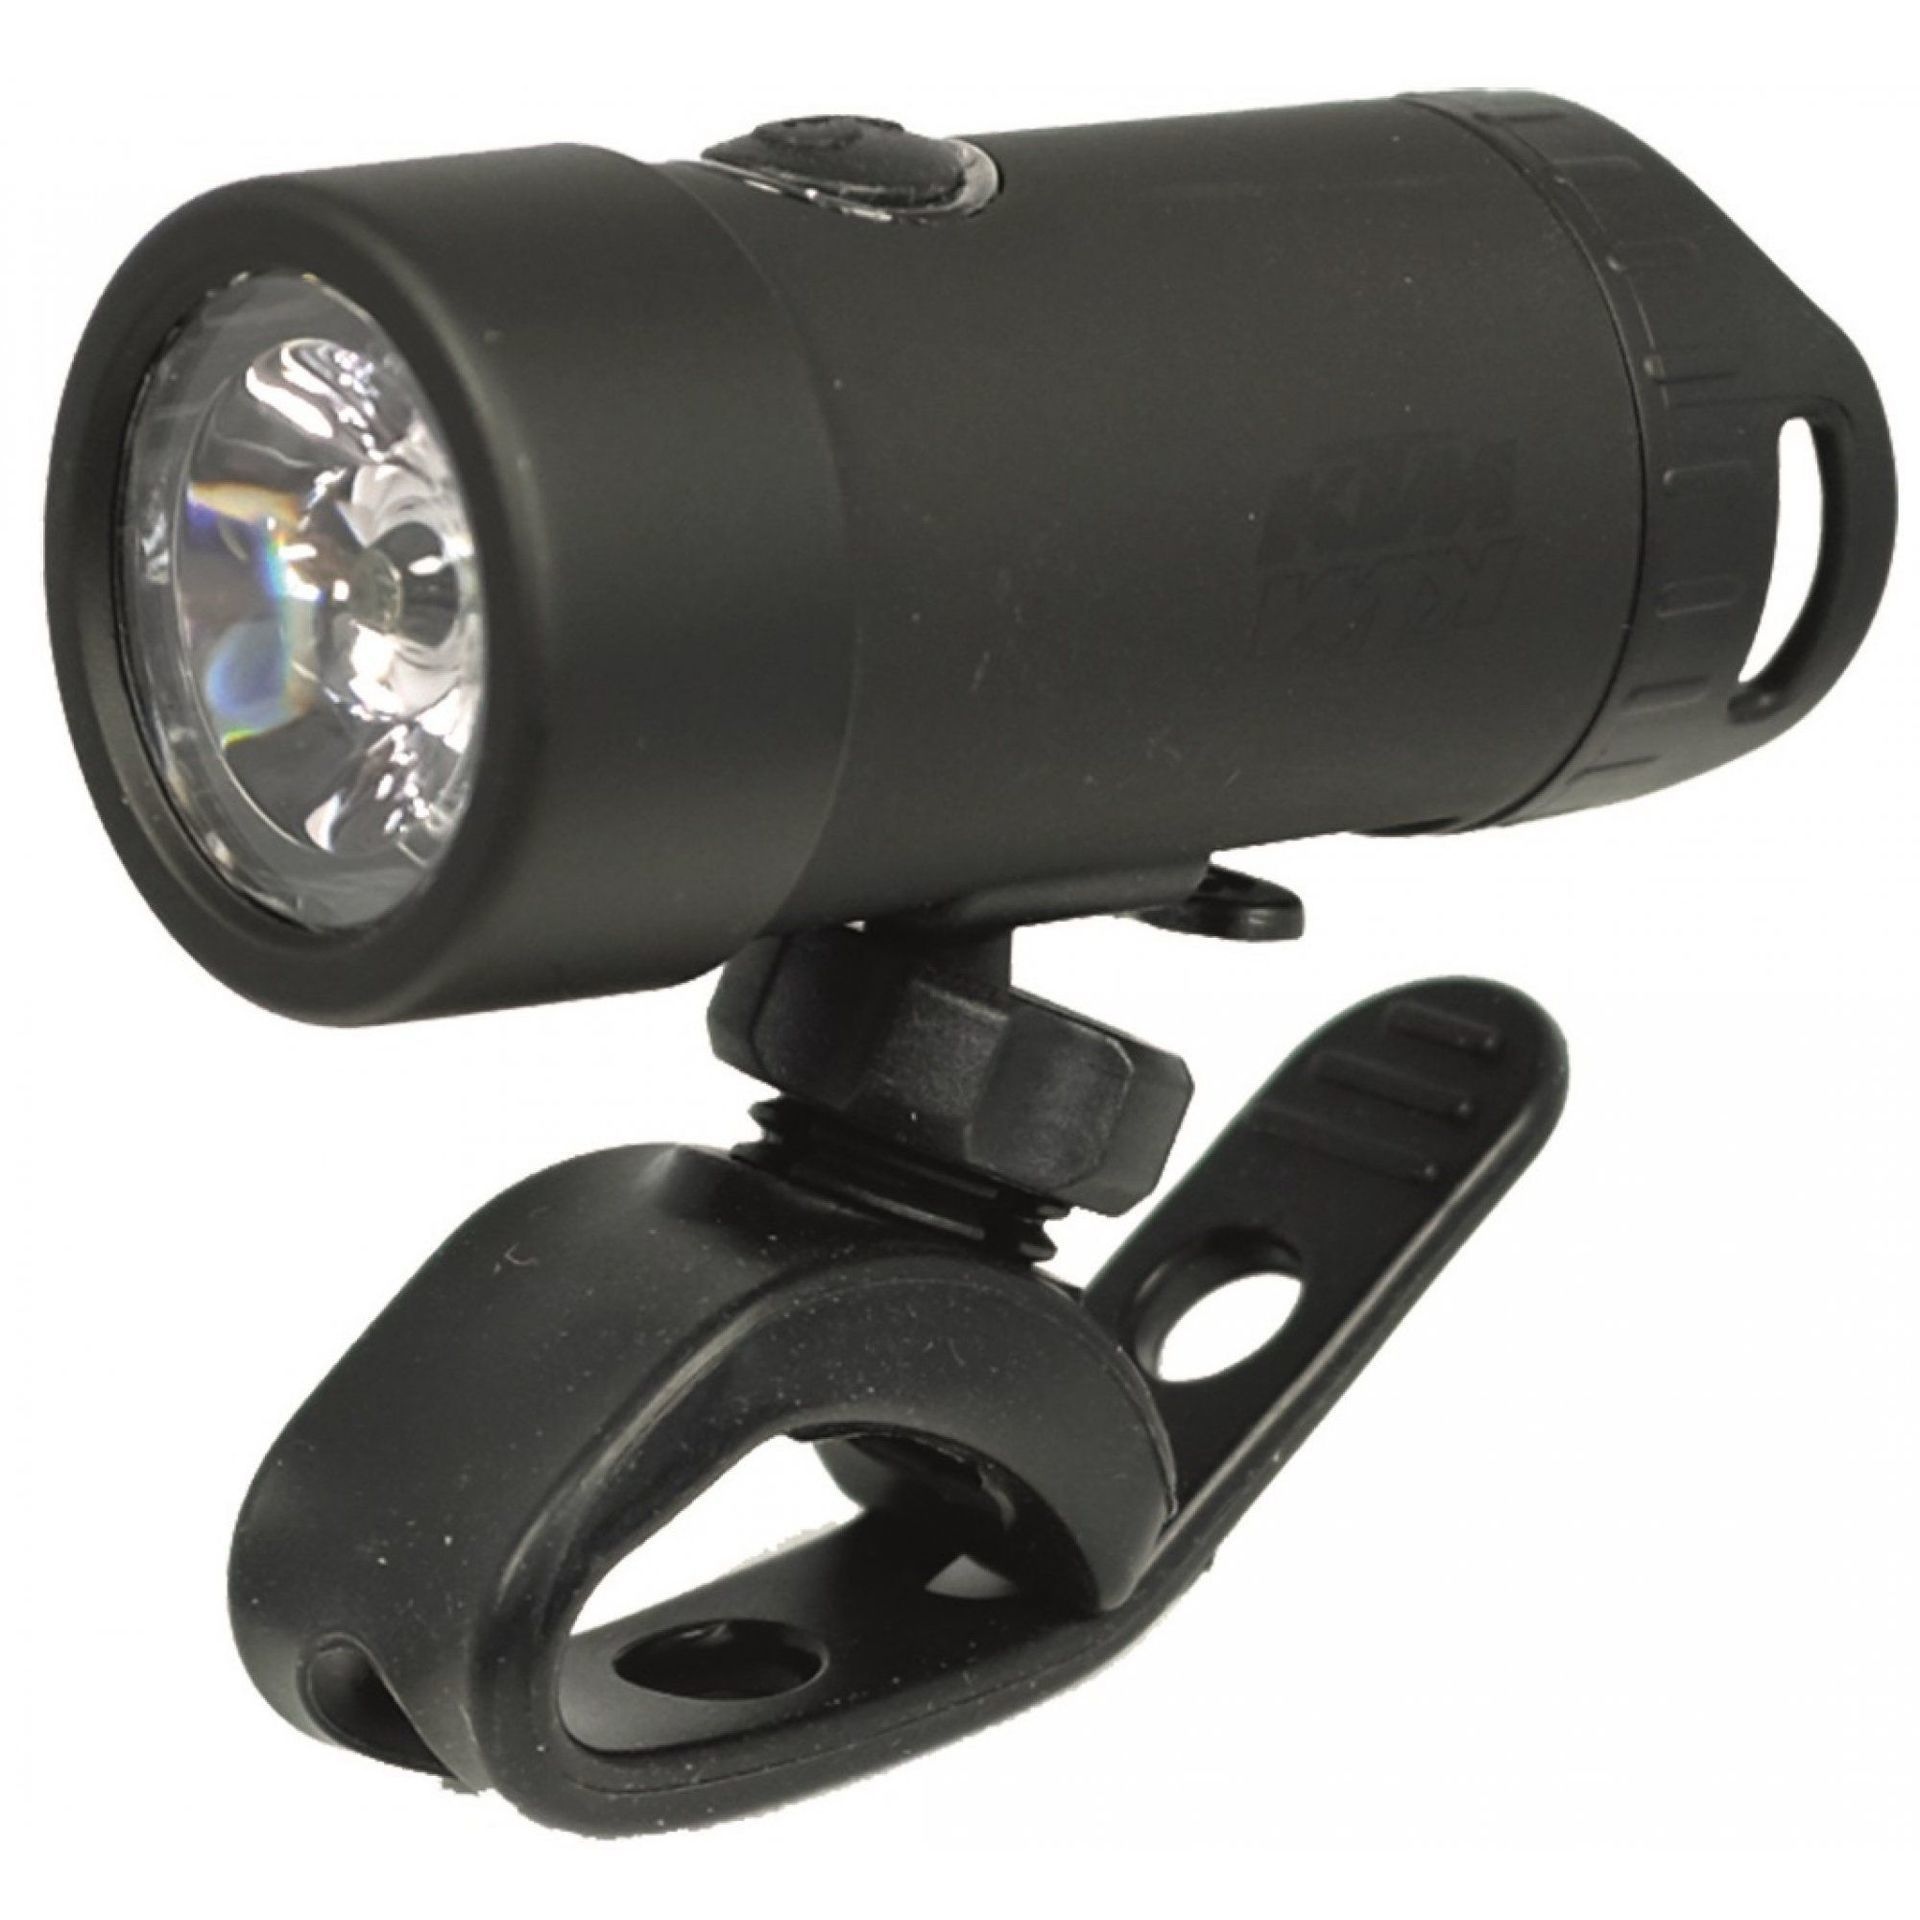 LAMPKA ROWEROWA PRZEDNIA KTM # HP LIGHT LED #